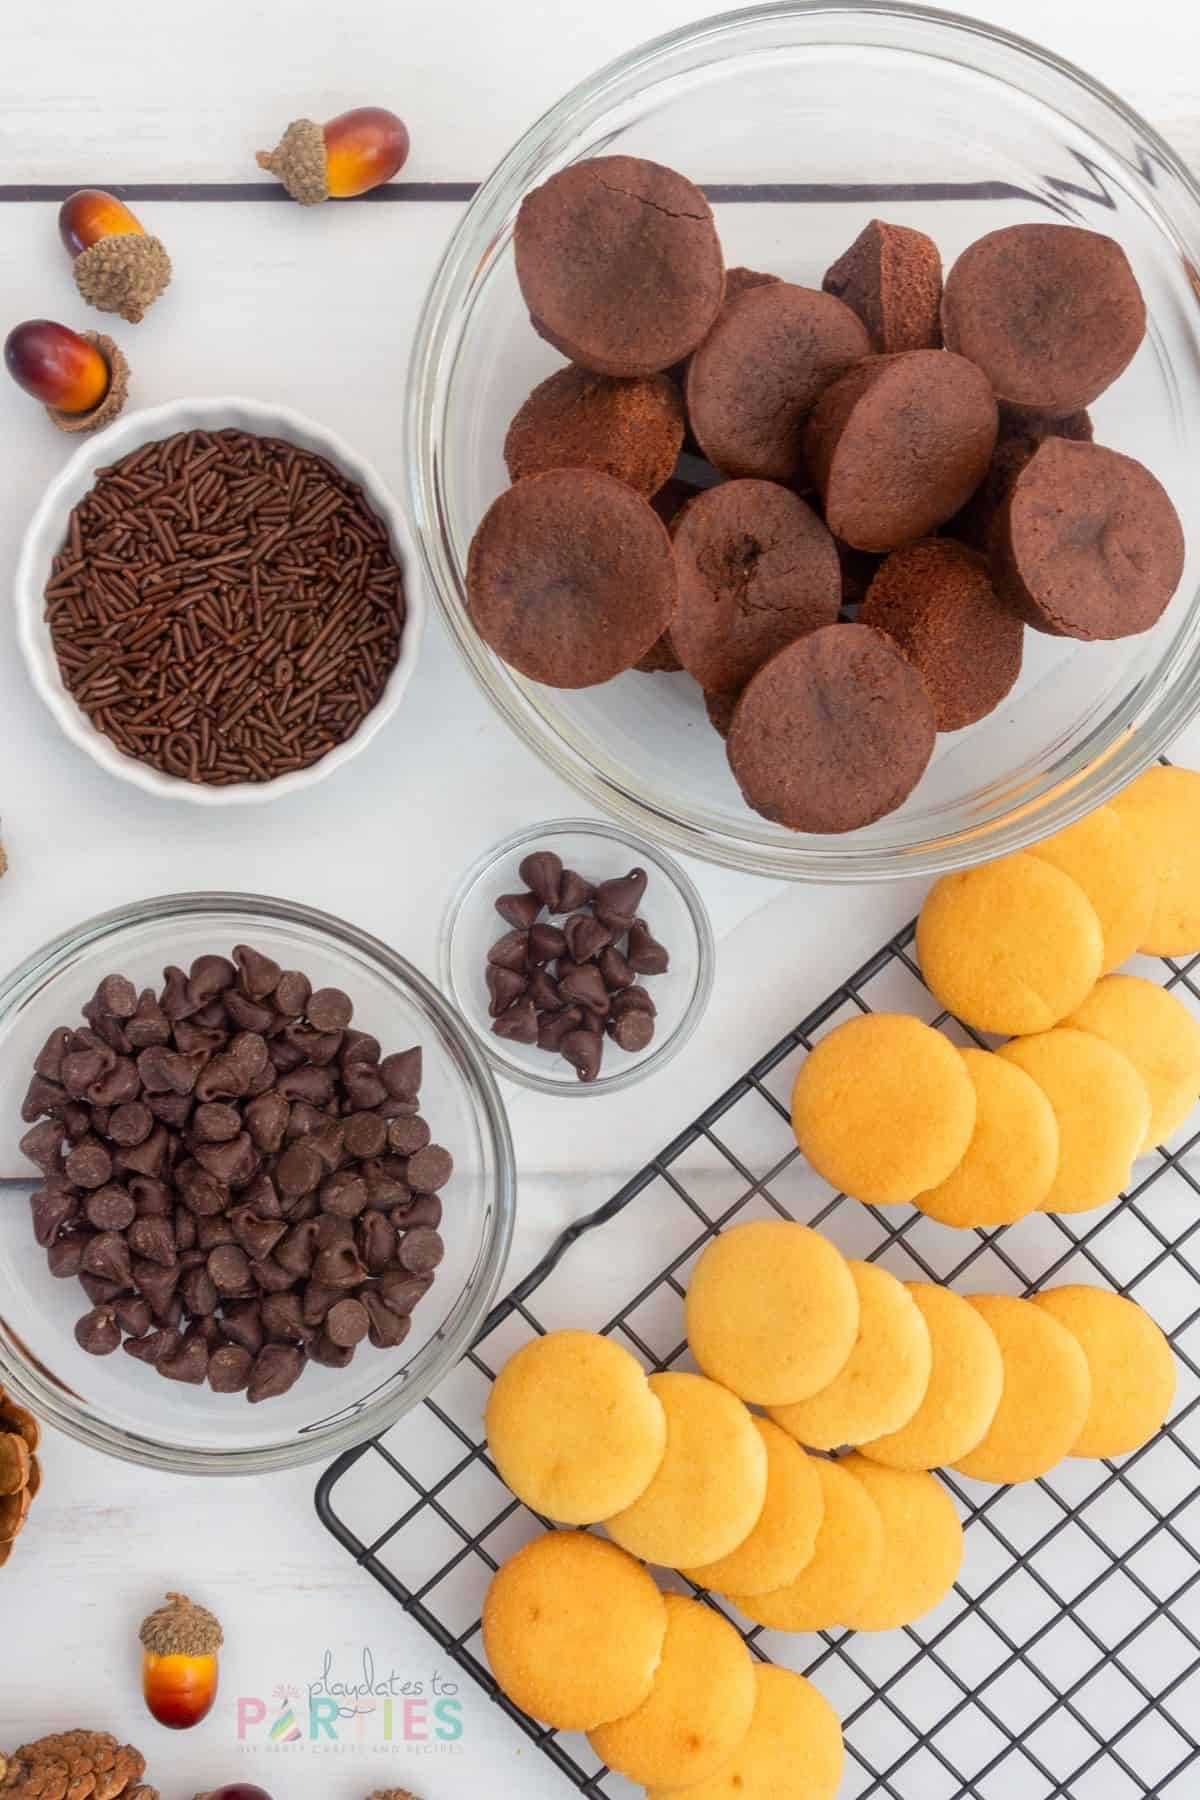 Ingredients: Nilla wafers, chocolate chips, brownie bites, chocolate sprinkles.